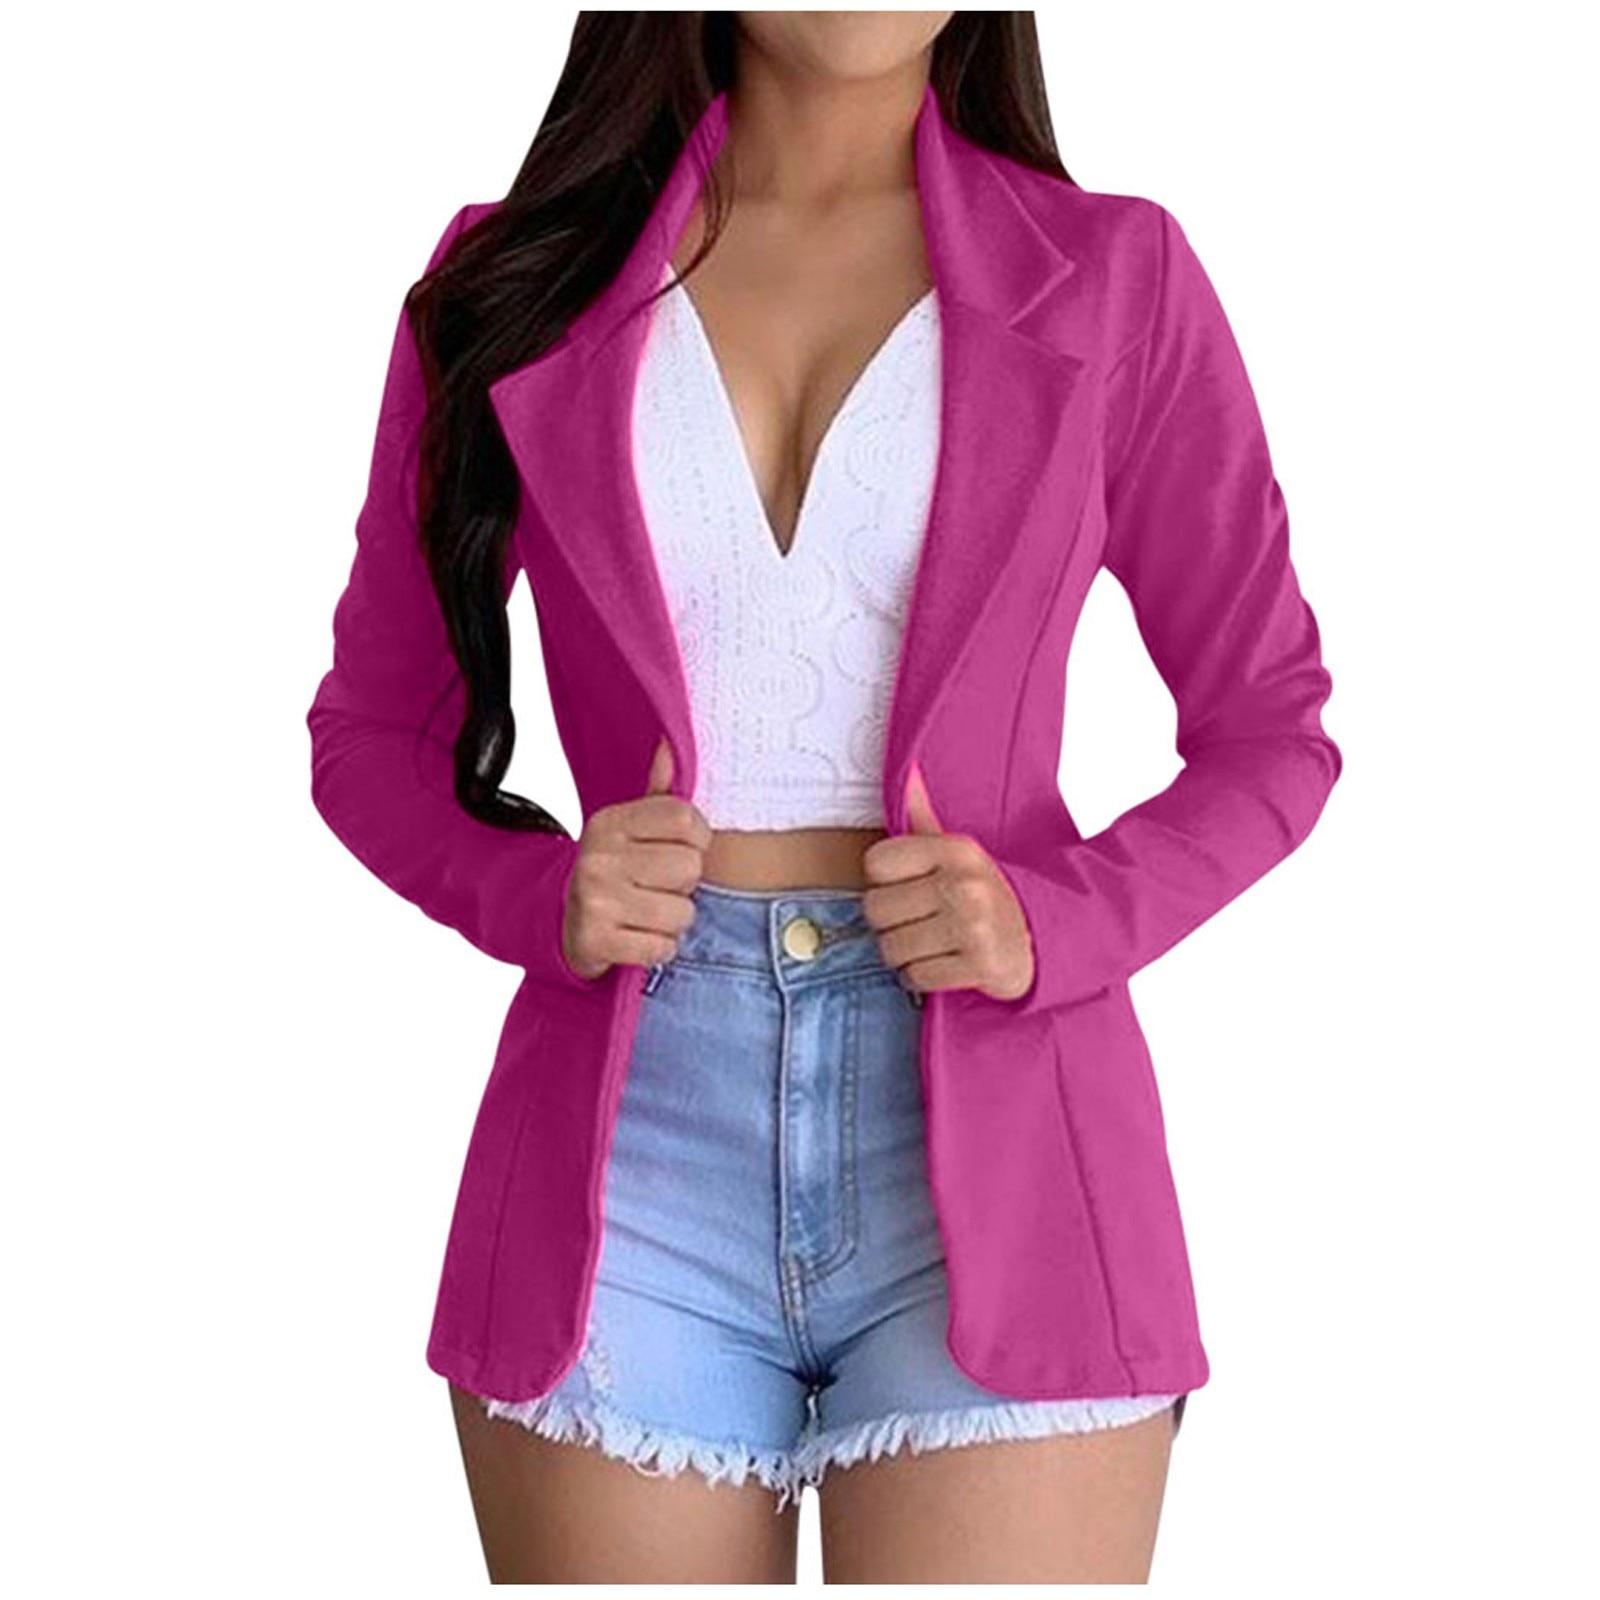 New Women Autumn Blazer Jacket Fashion Basic Blazer Casual Solid Button Long Sleeve Work Suit Coat O